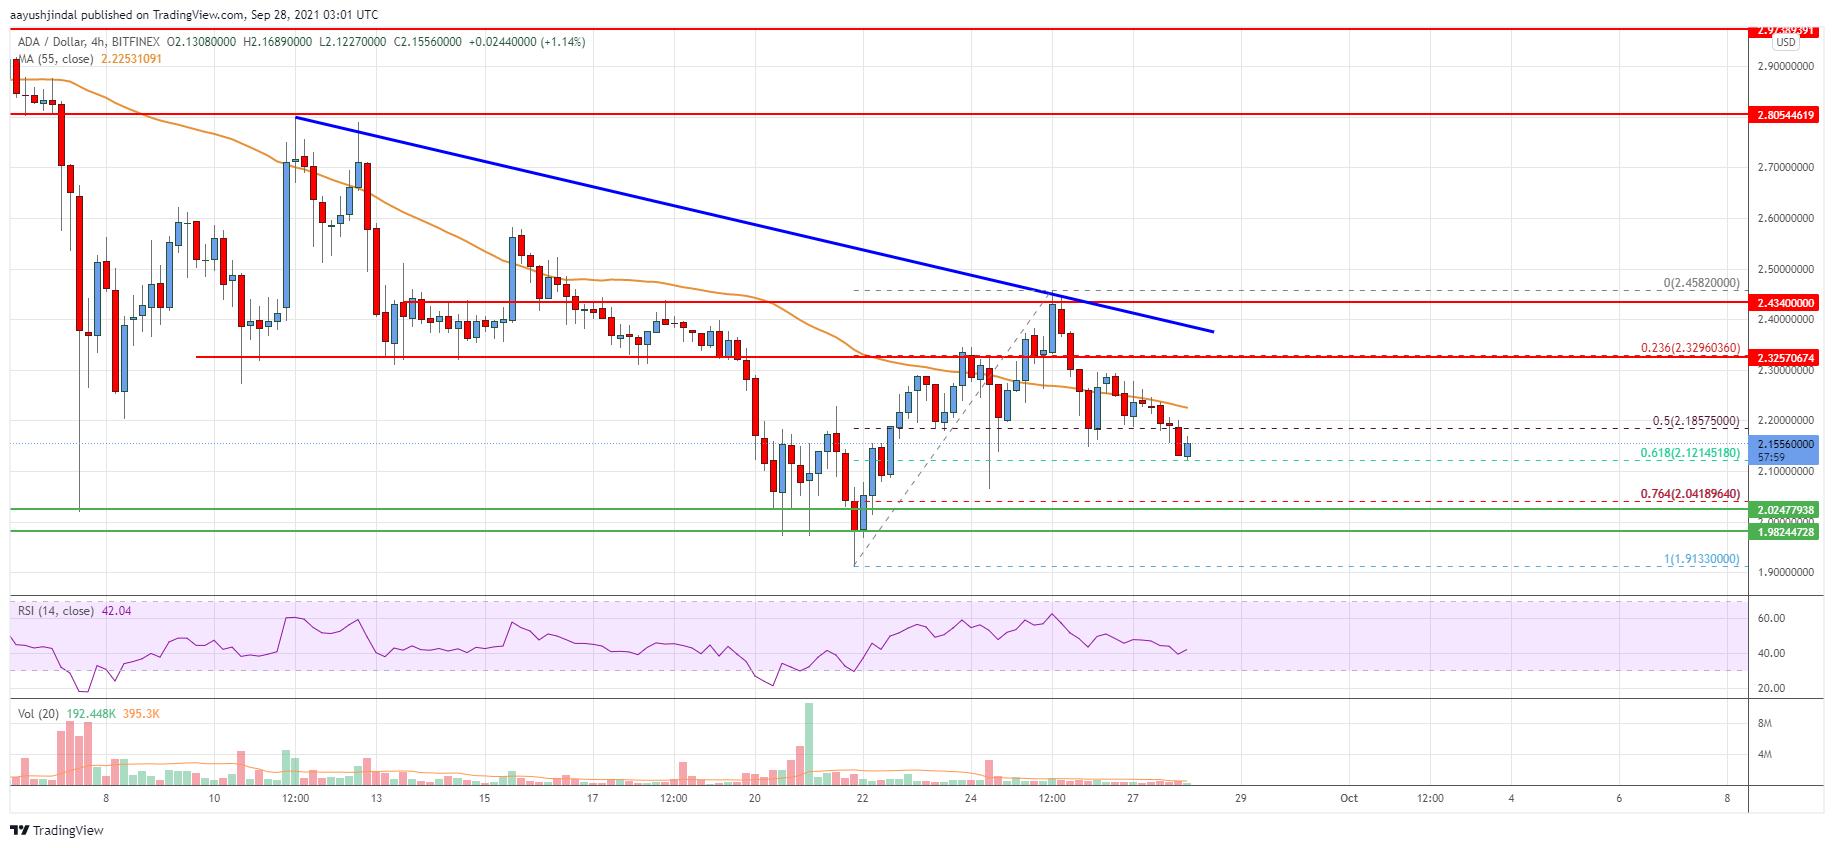 Cardano (ADA) Price Analysis: Risk of More Downsides Below $2